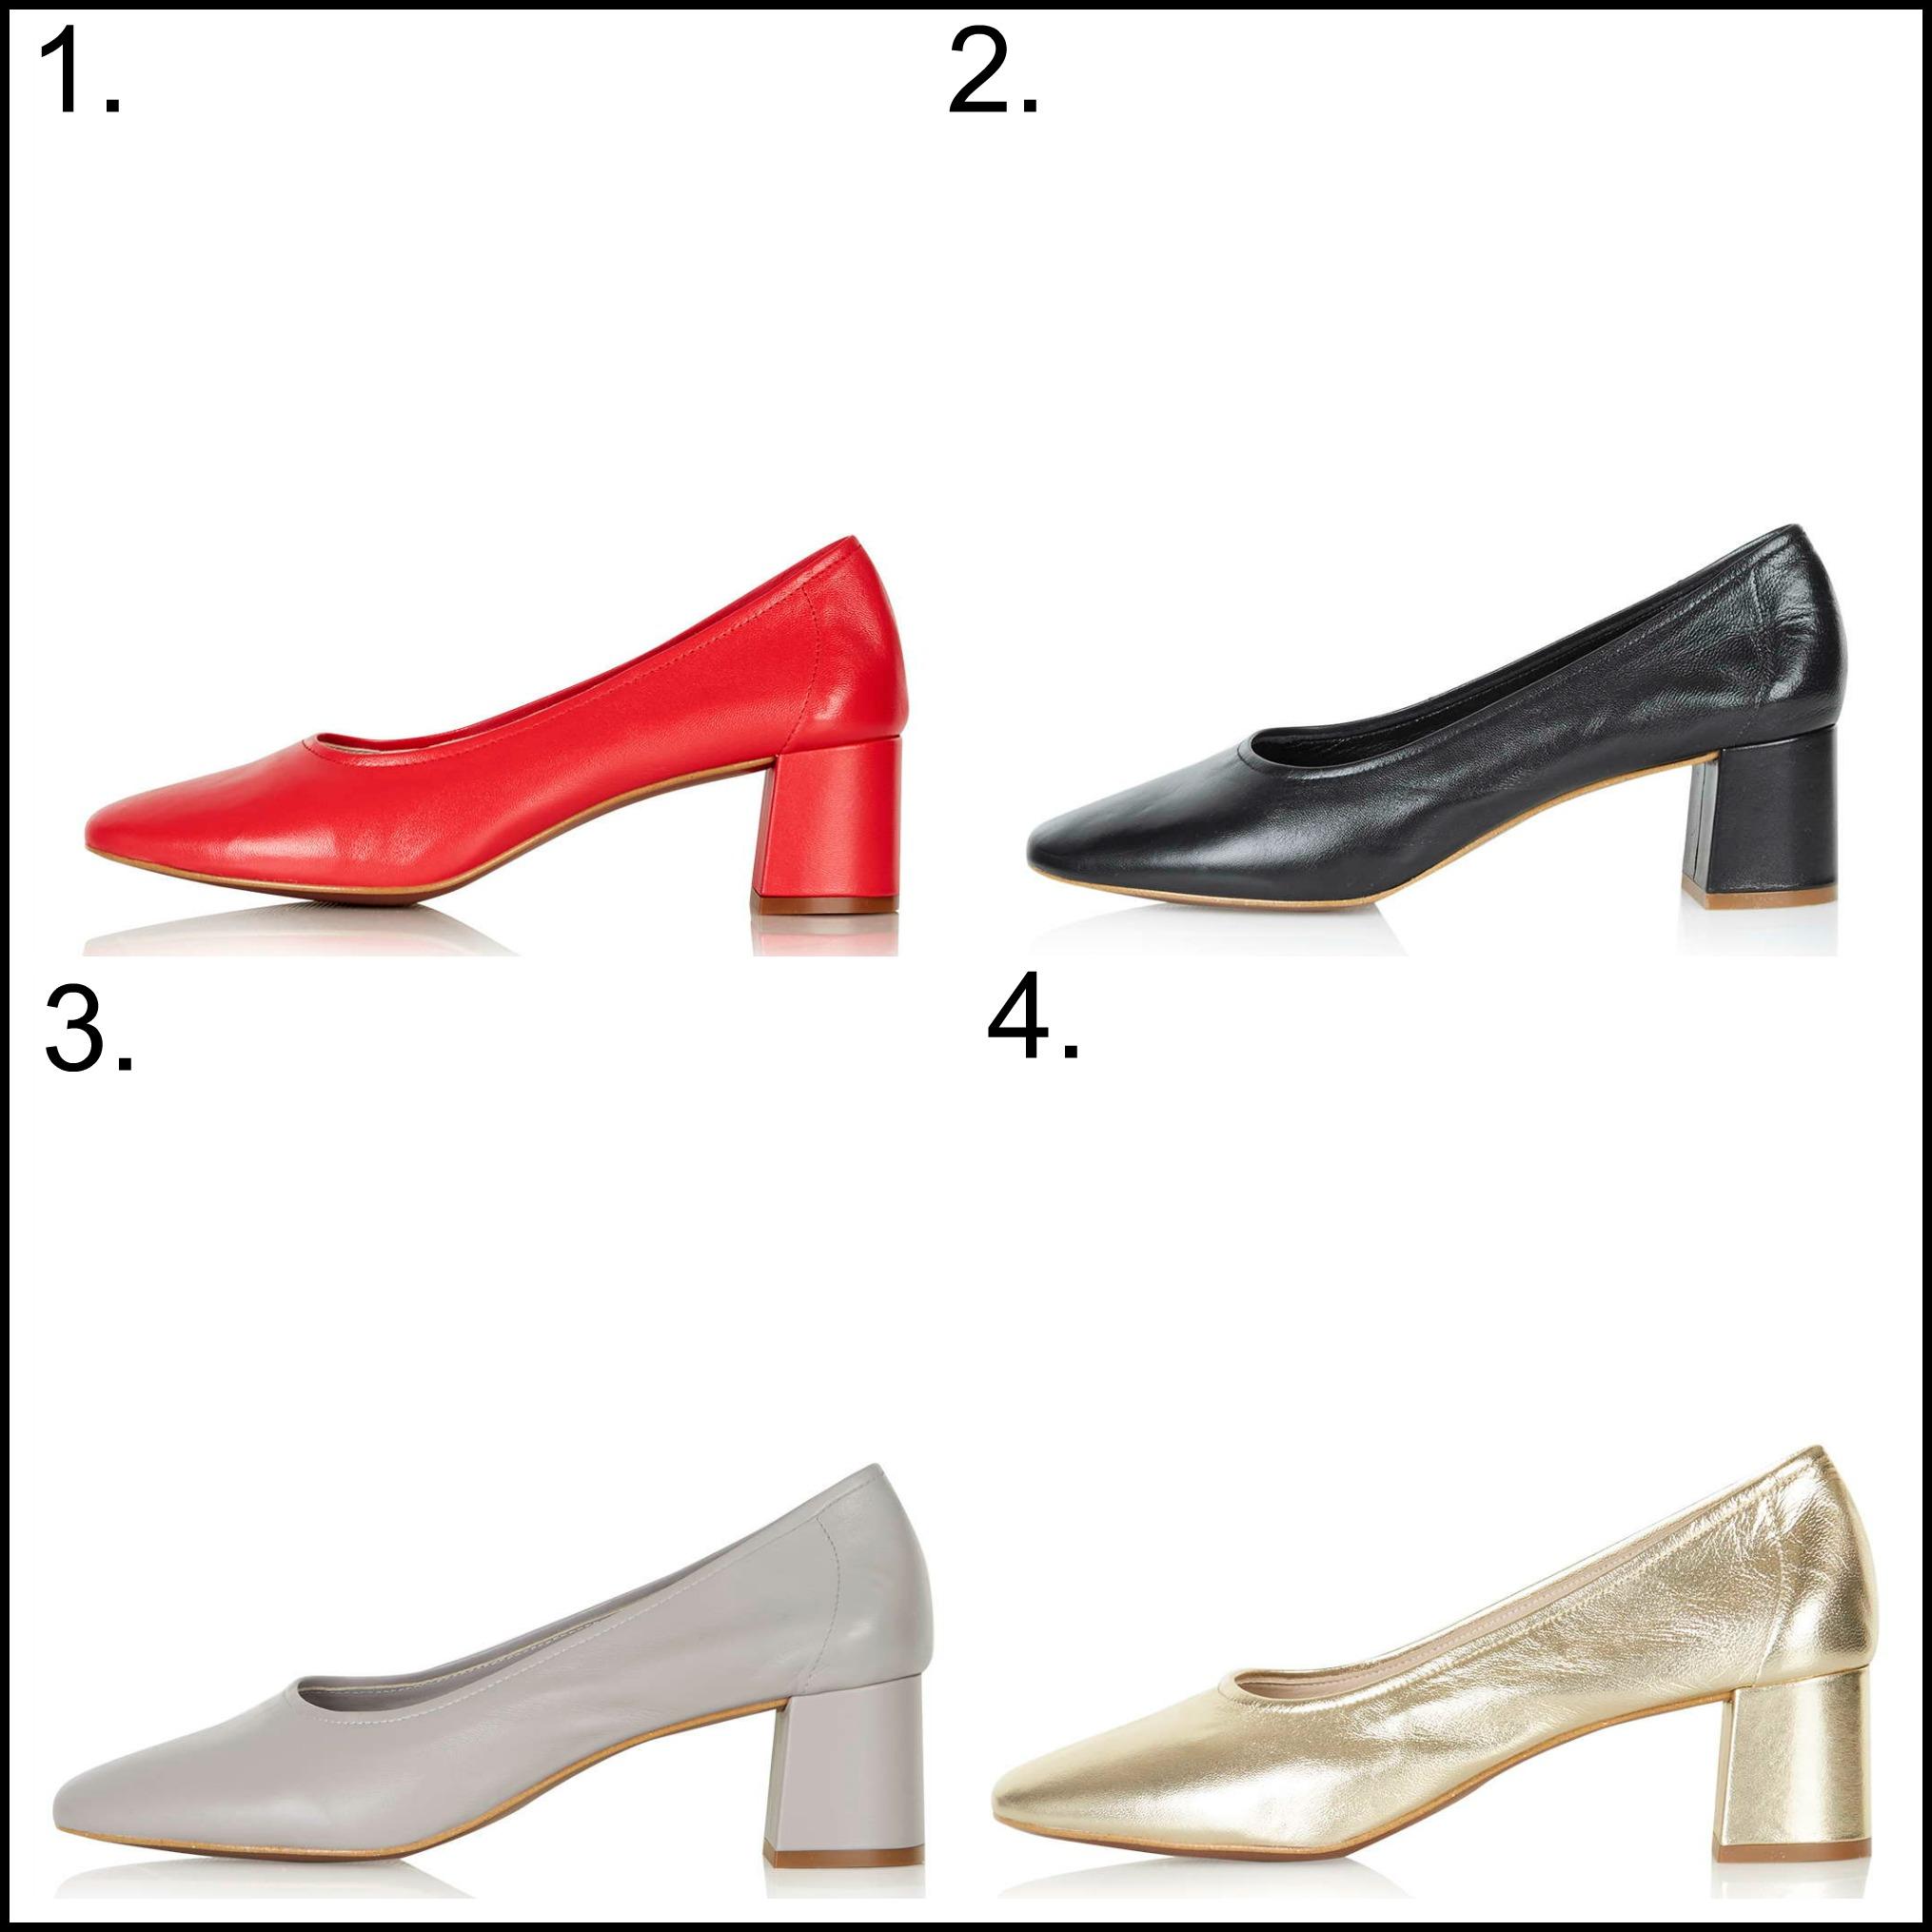 Topshop shoes.jpg